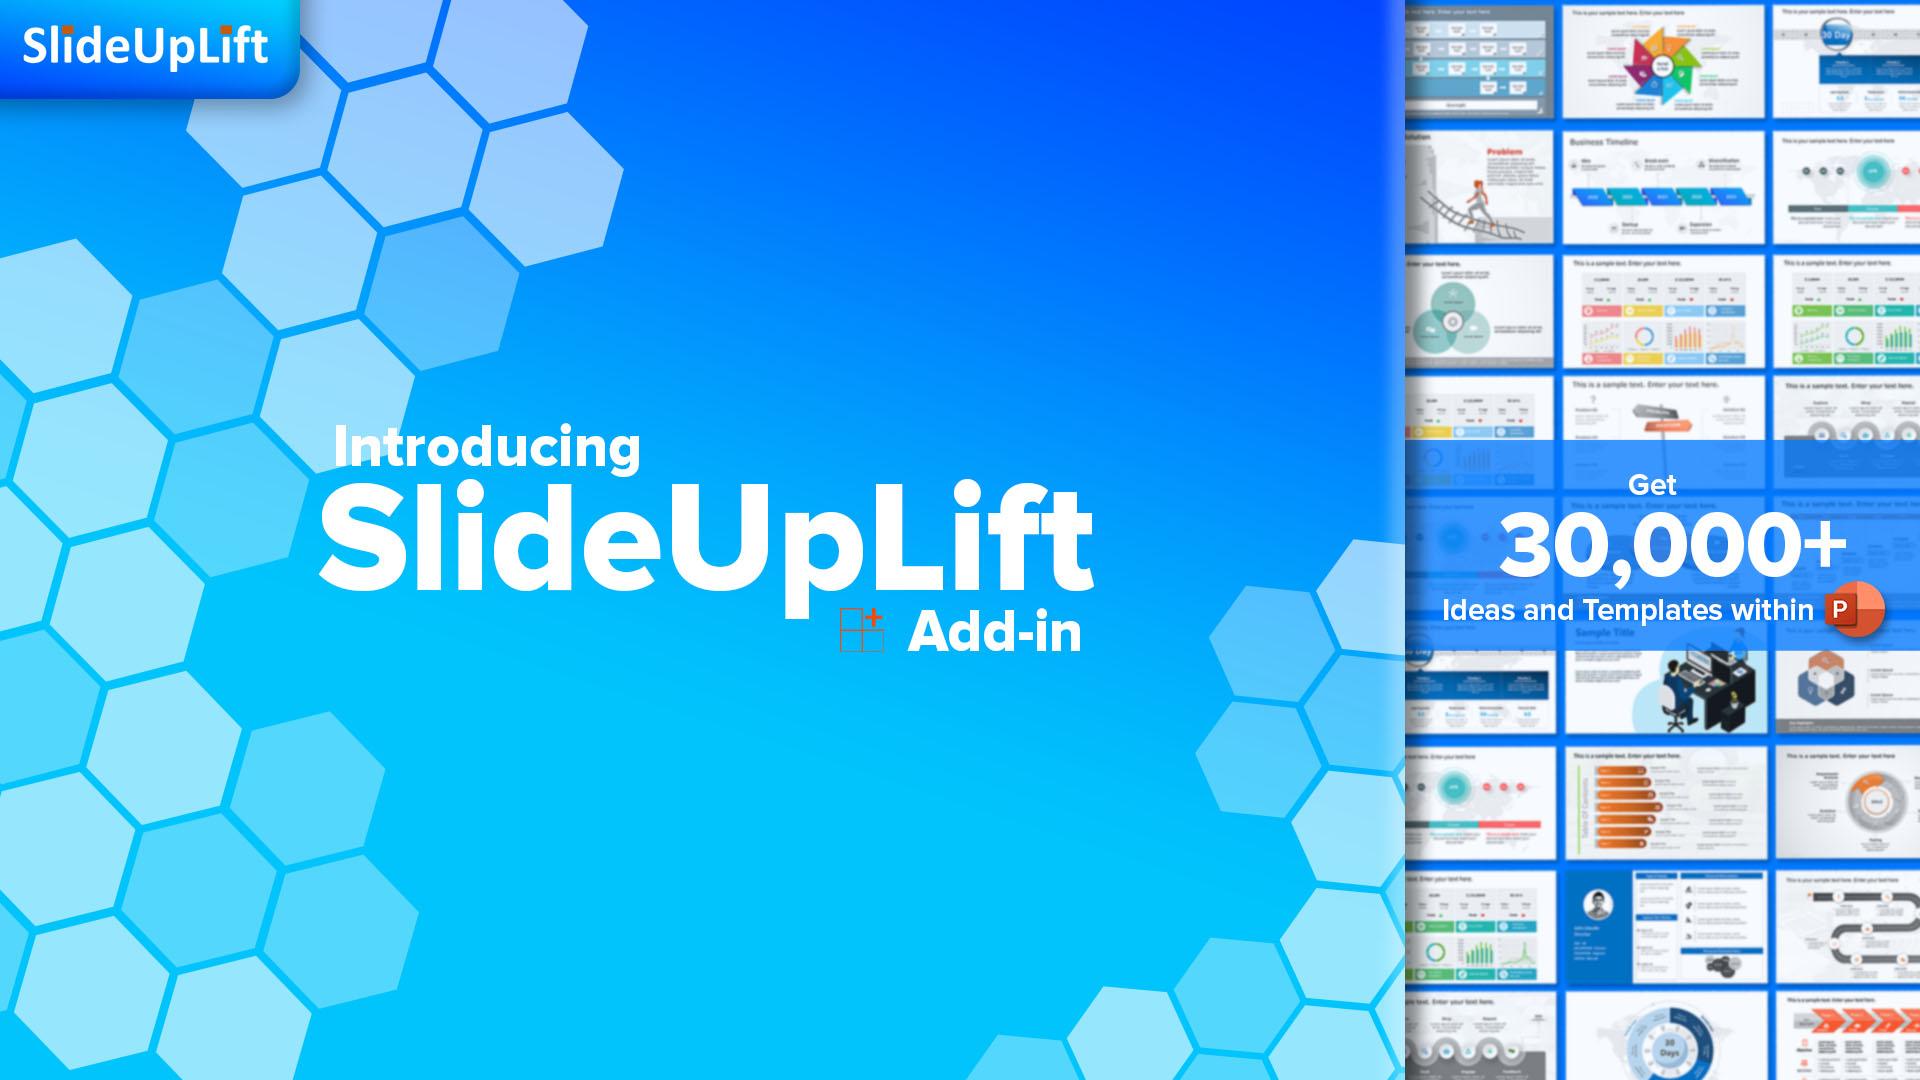 SlideUpLift Add-in: An Intelligent Companion to PowerPoint